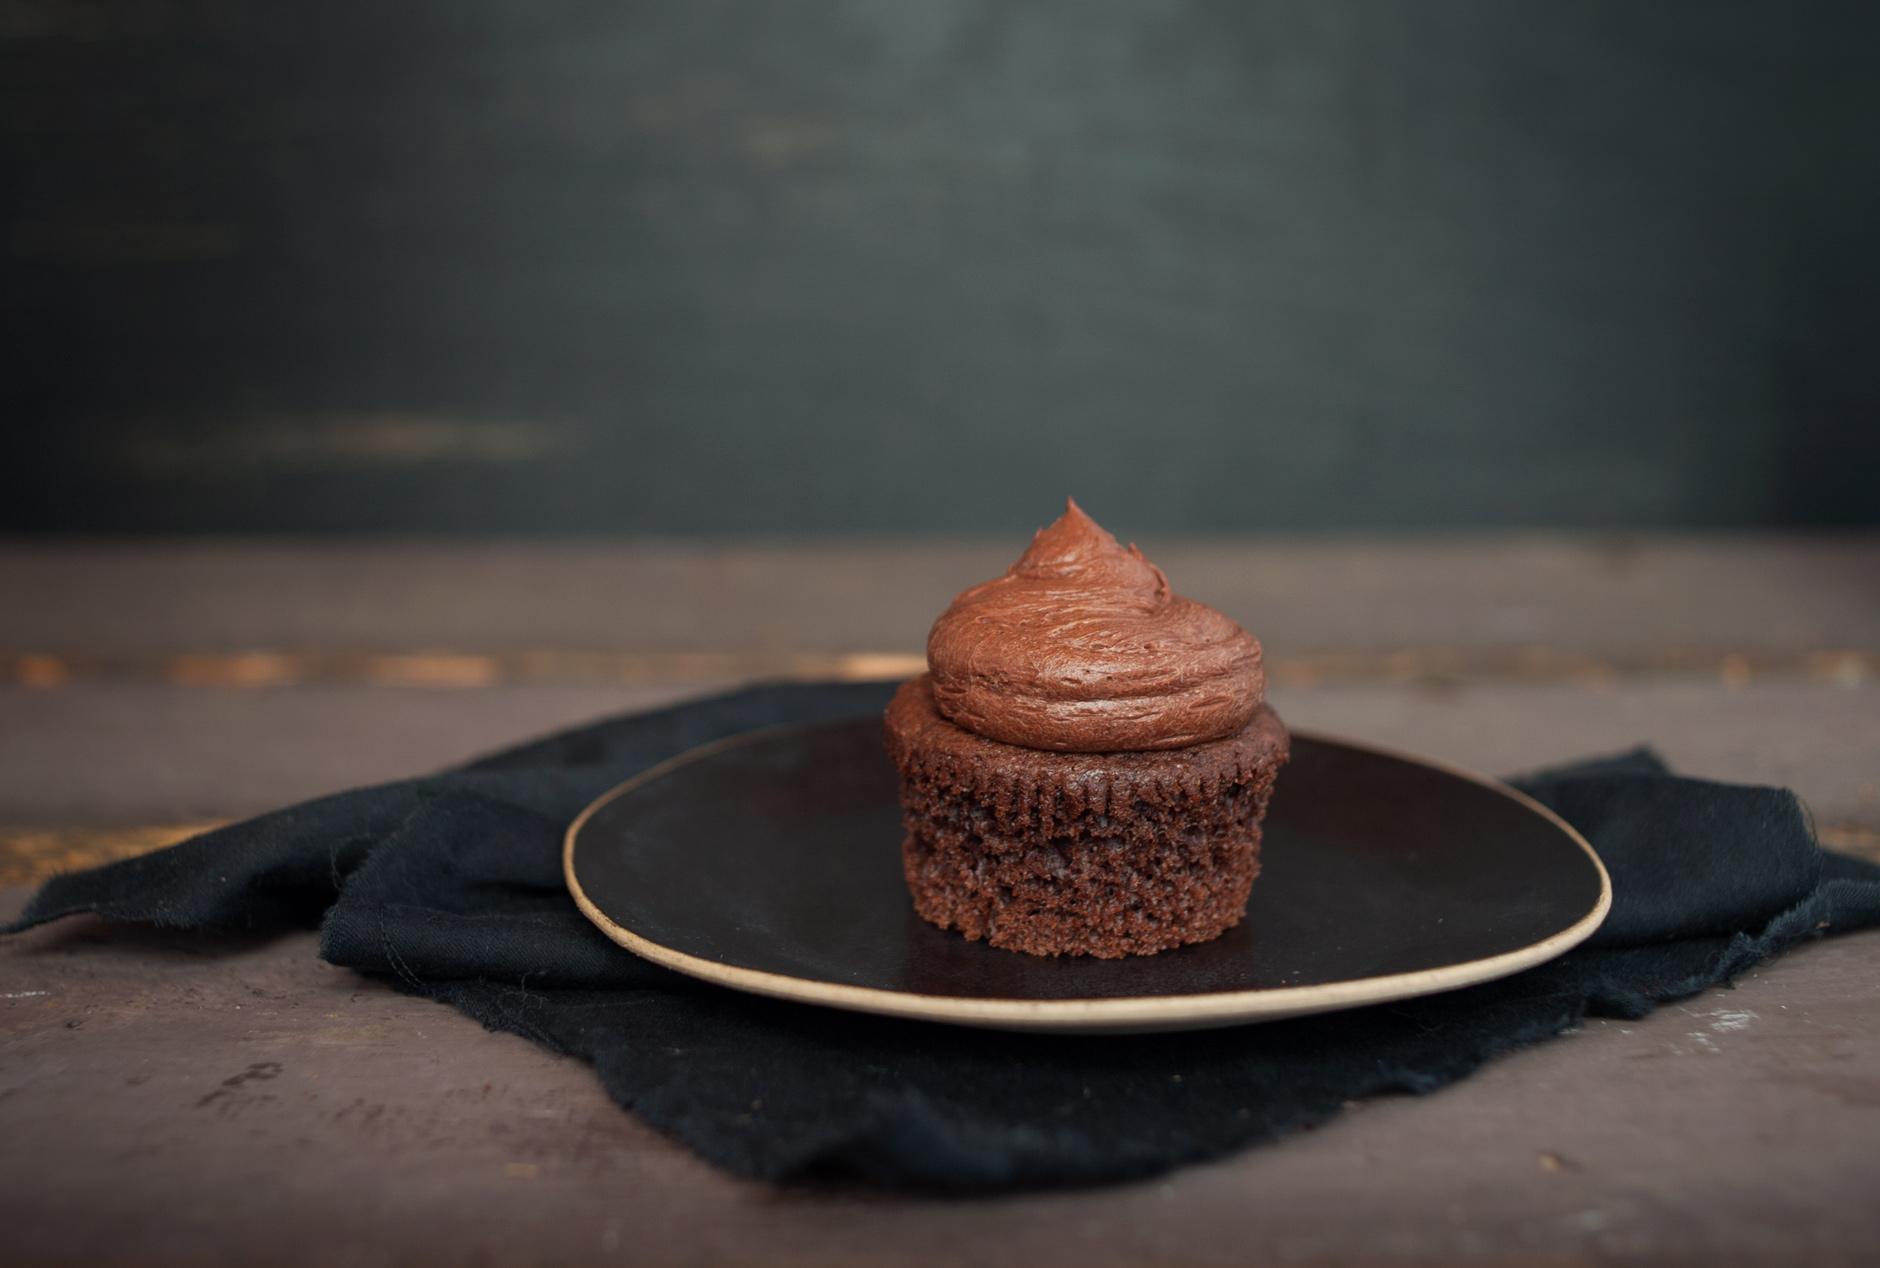 ChocolateCupcakes_food_photography_4.jpg